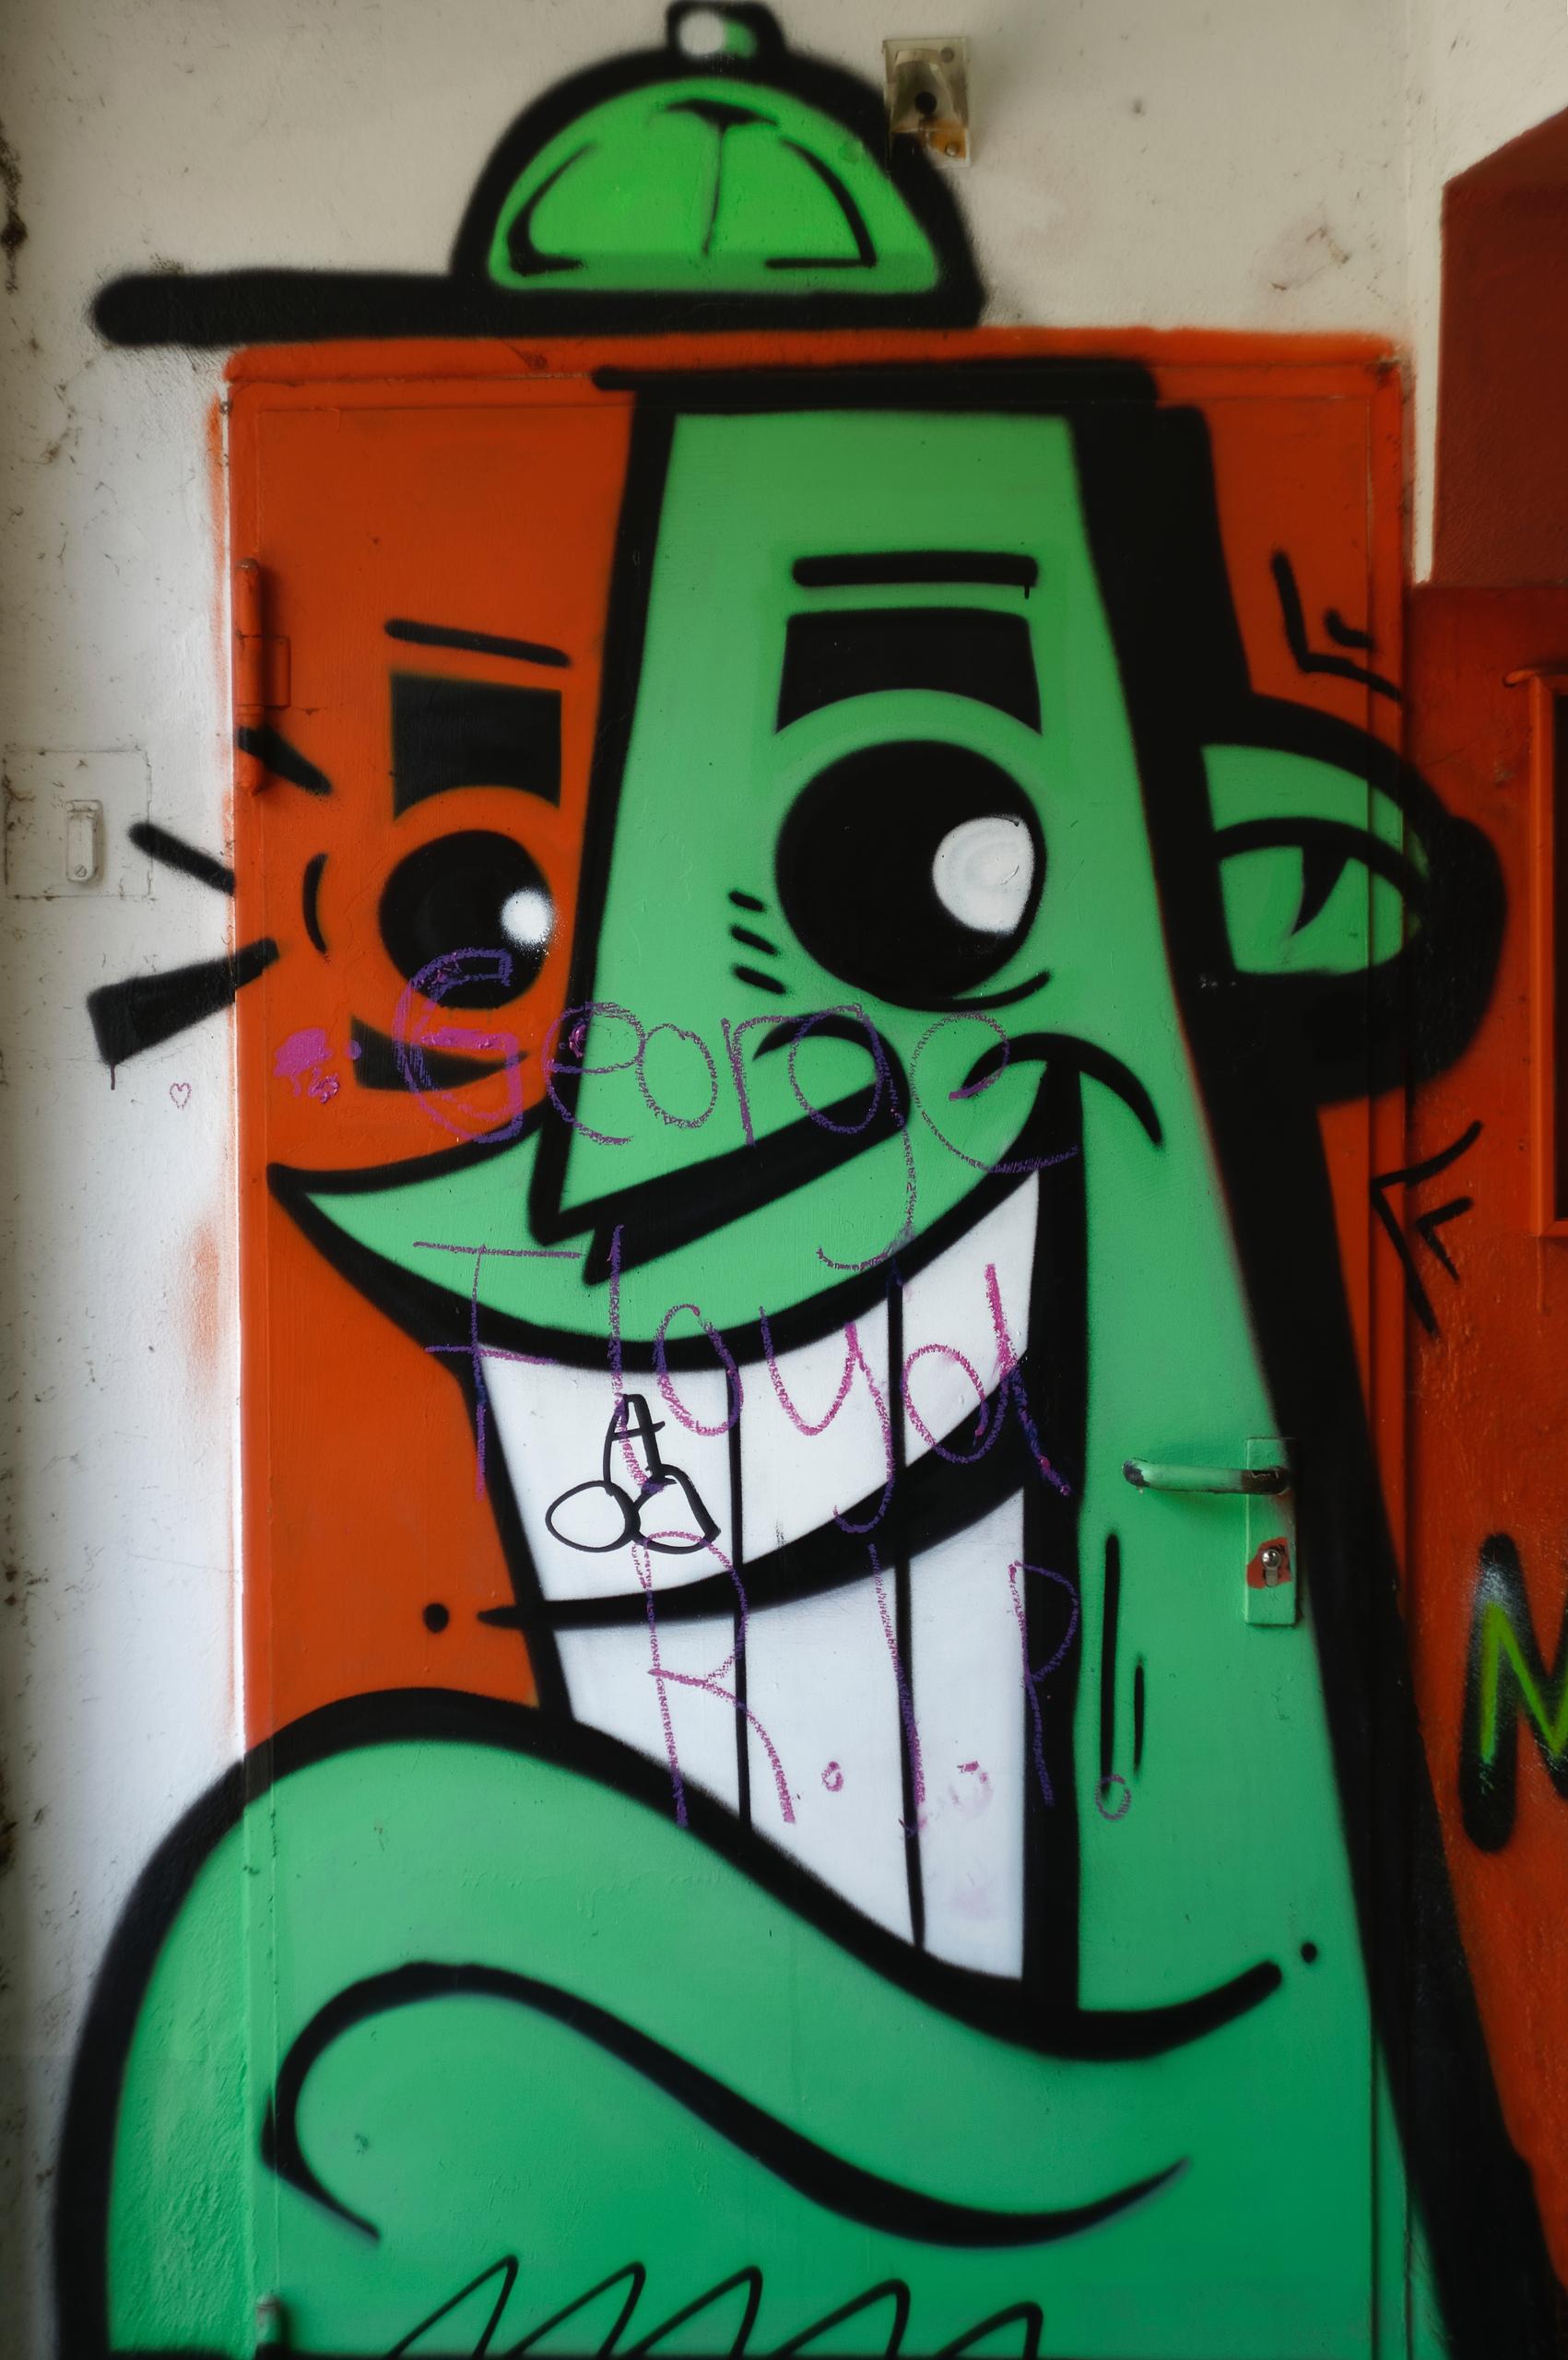 Larry - photography, graffiti, vandalism - marcushammerschmitt | ello